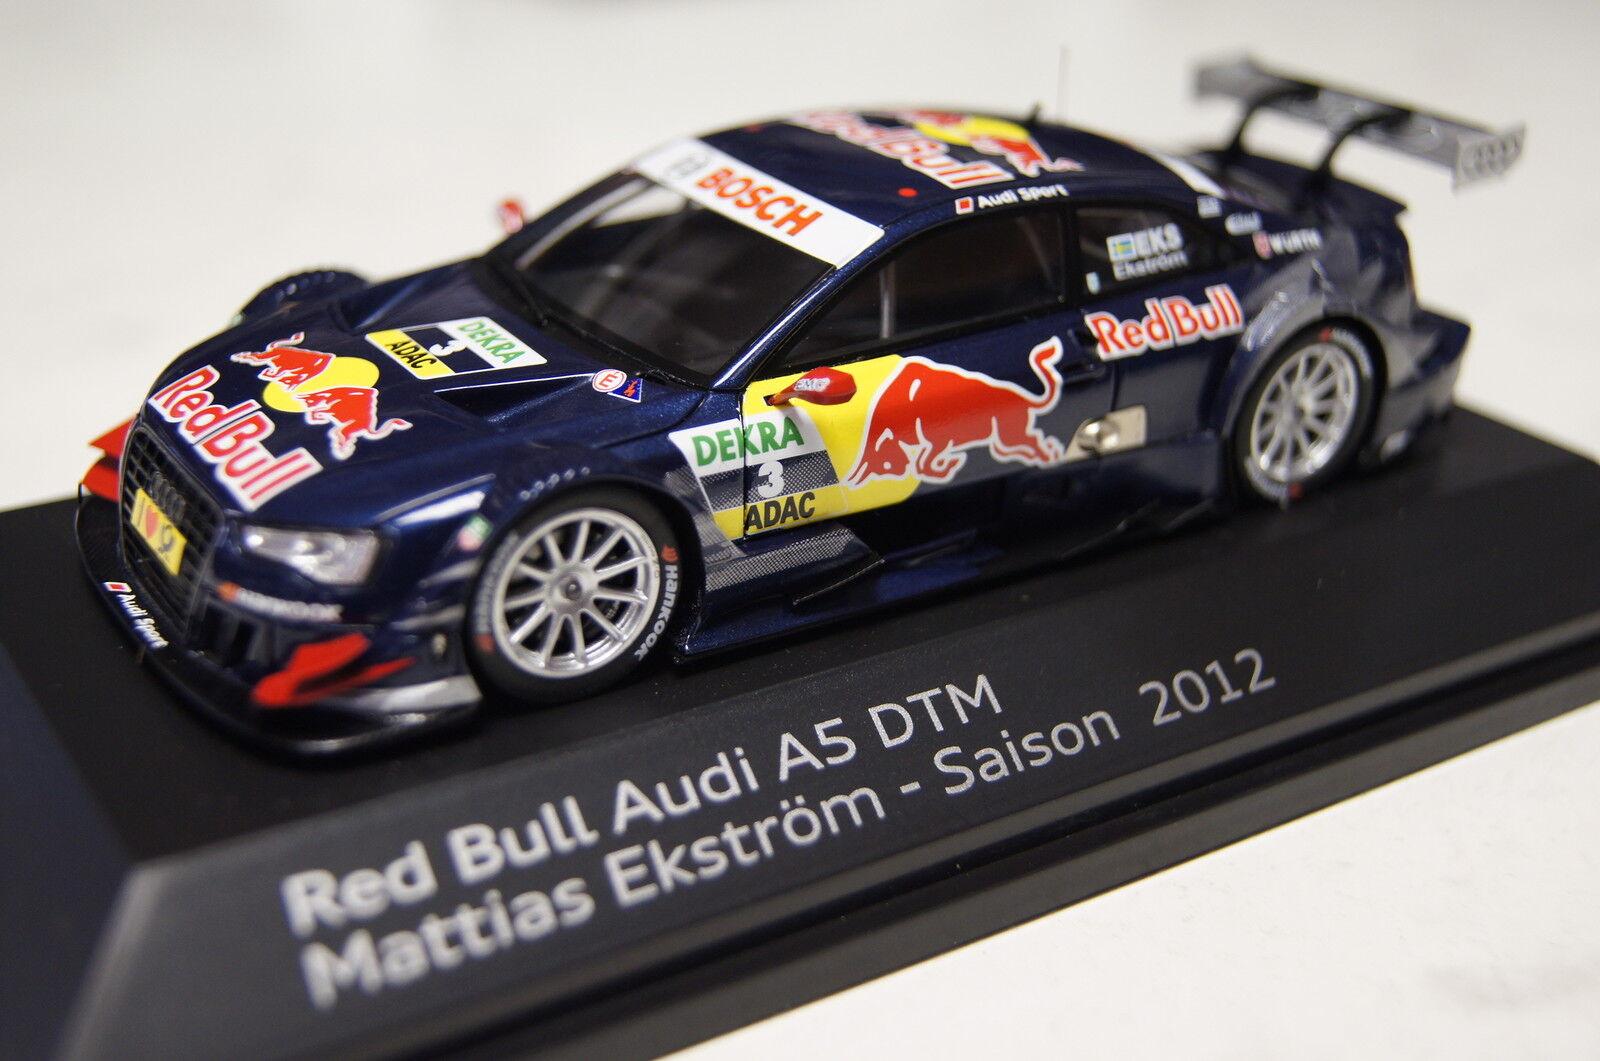 Audi a5 dtm 2012 m, ekst ö m   3 1 43 funke neu + ovp